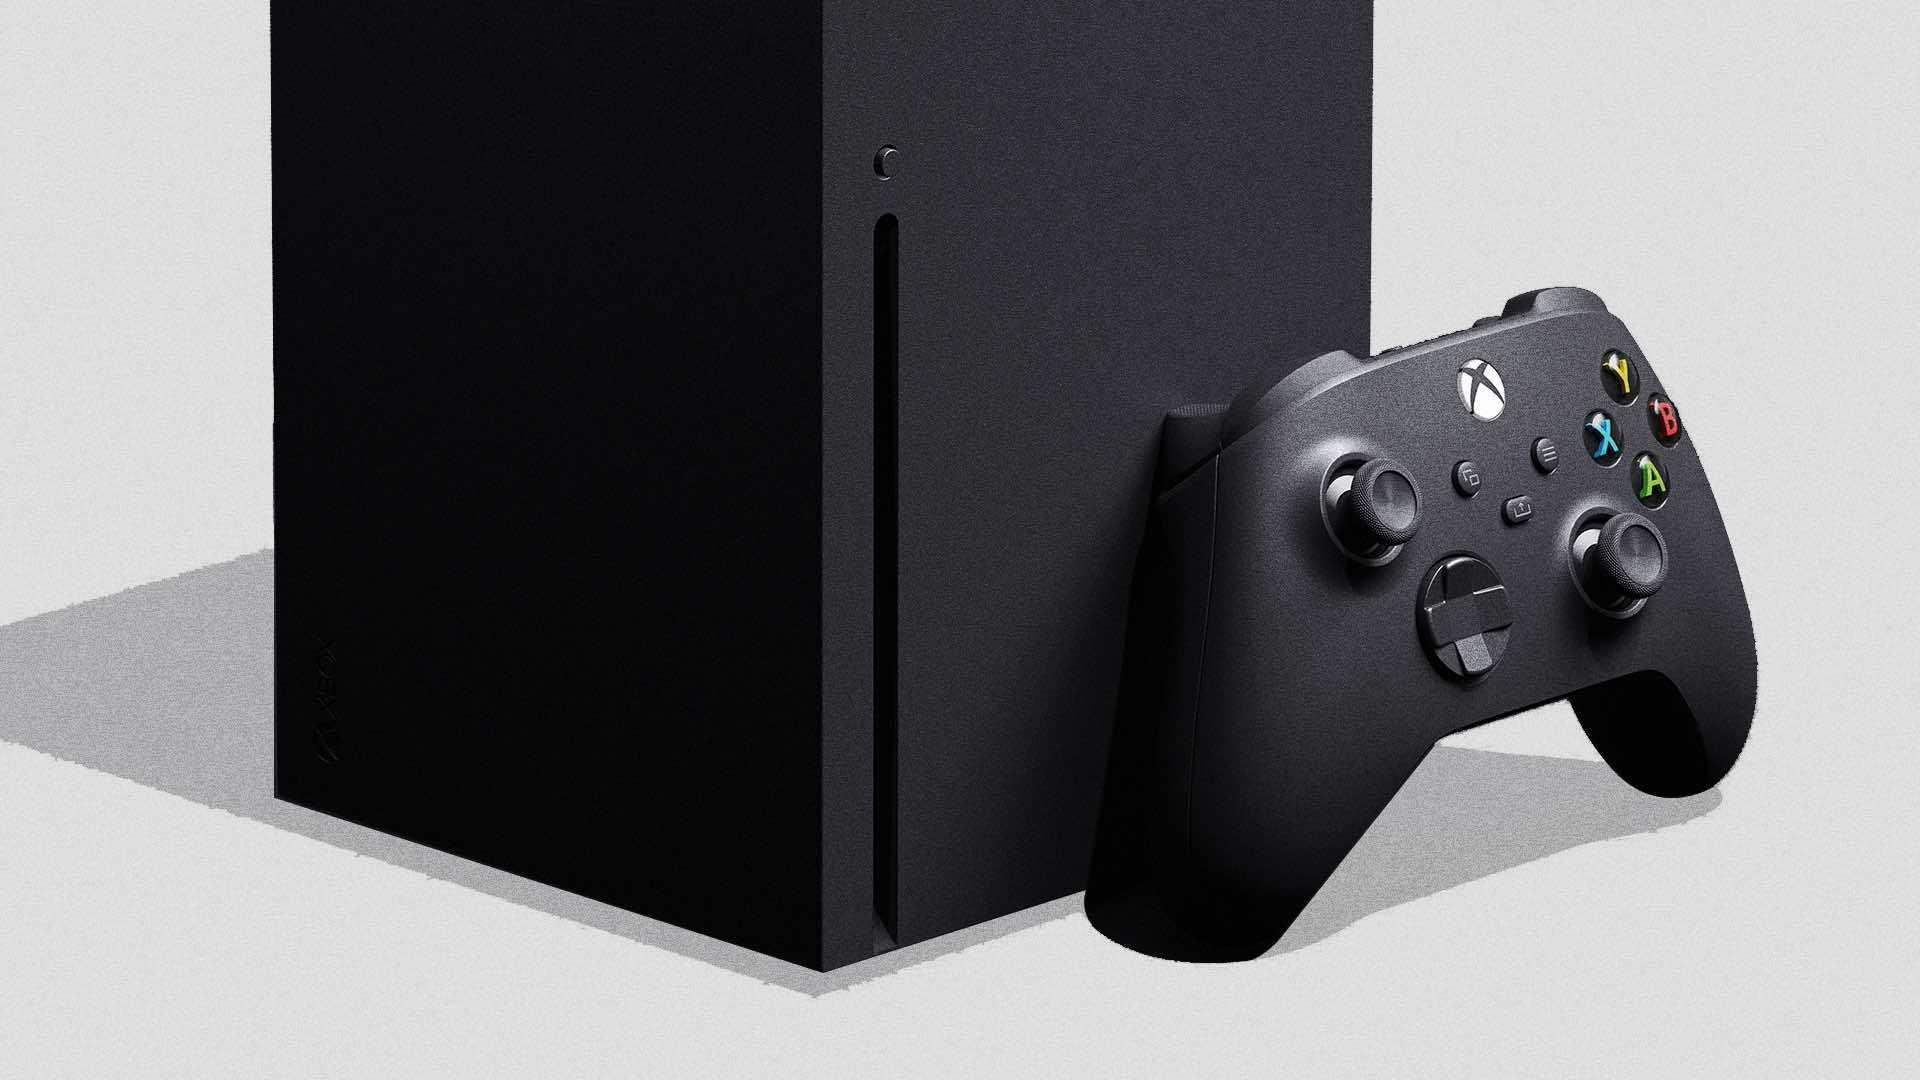 Microsoft is talking about Xbox Series X next week screenshot